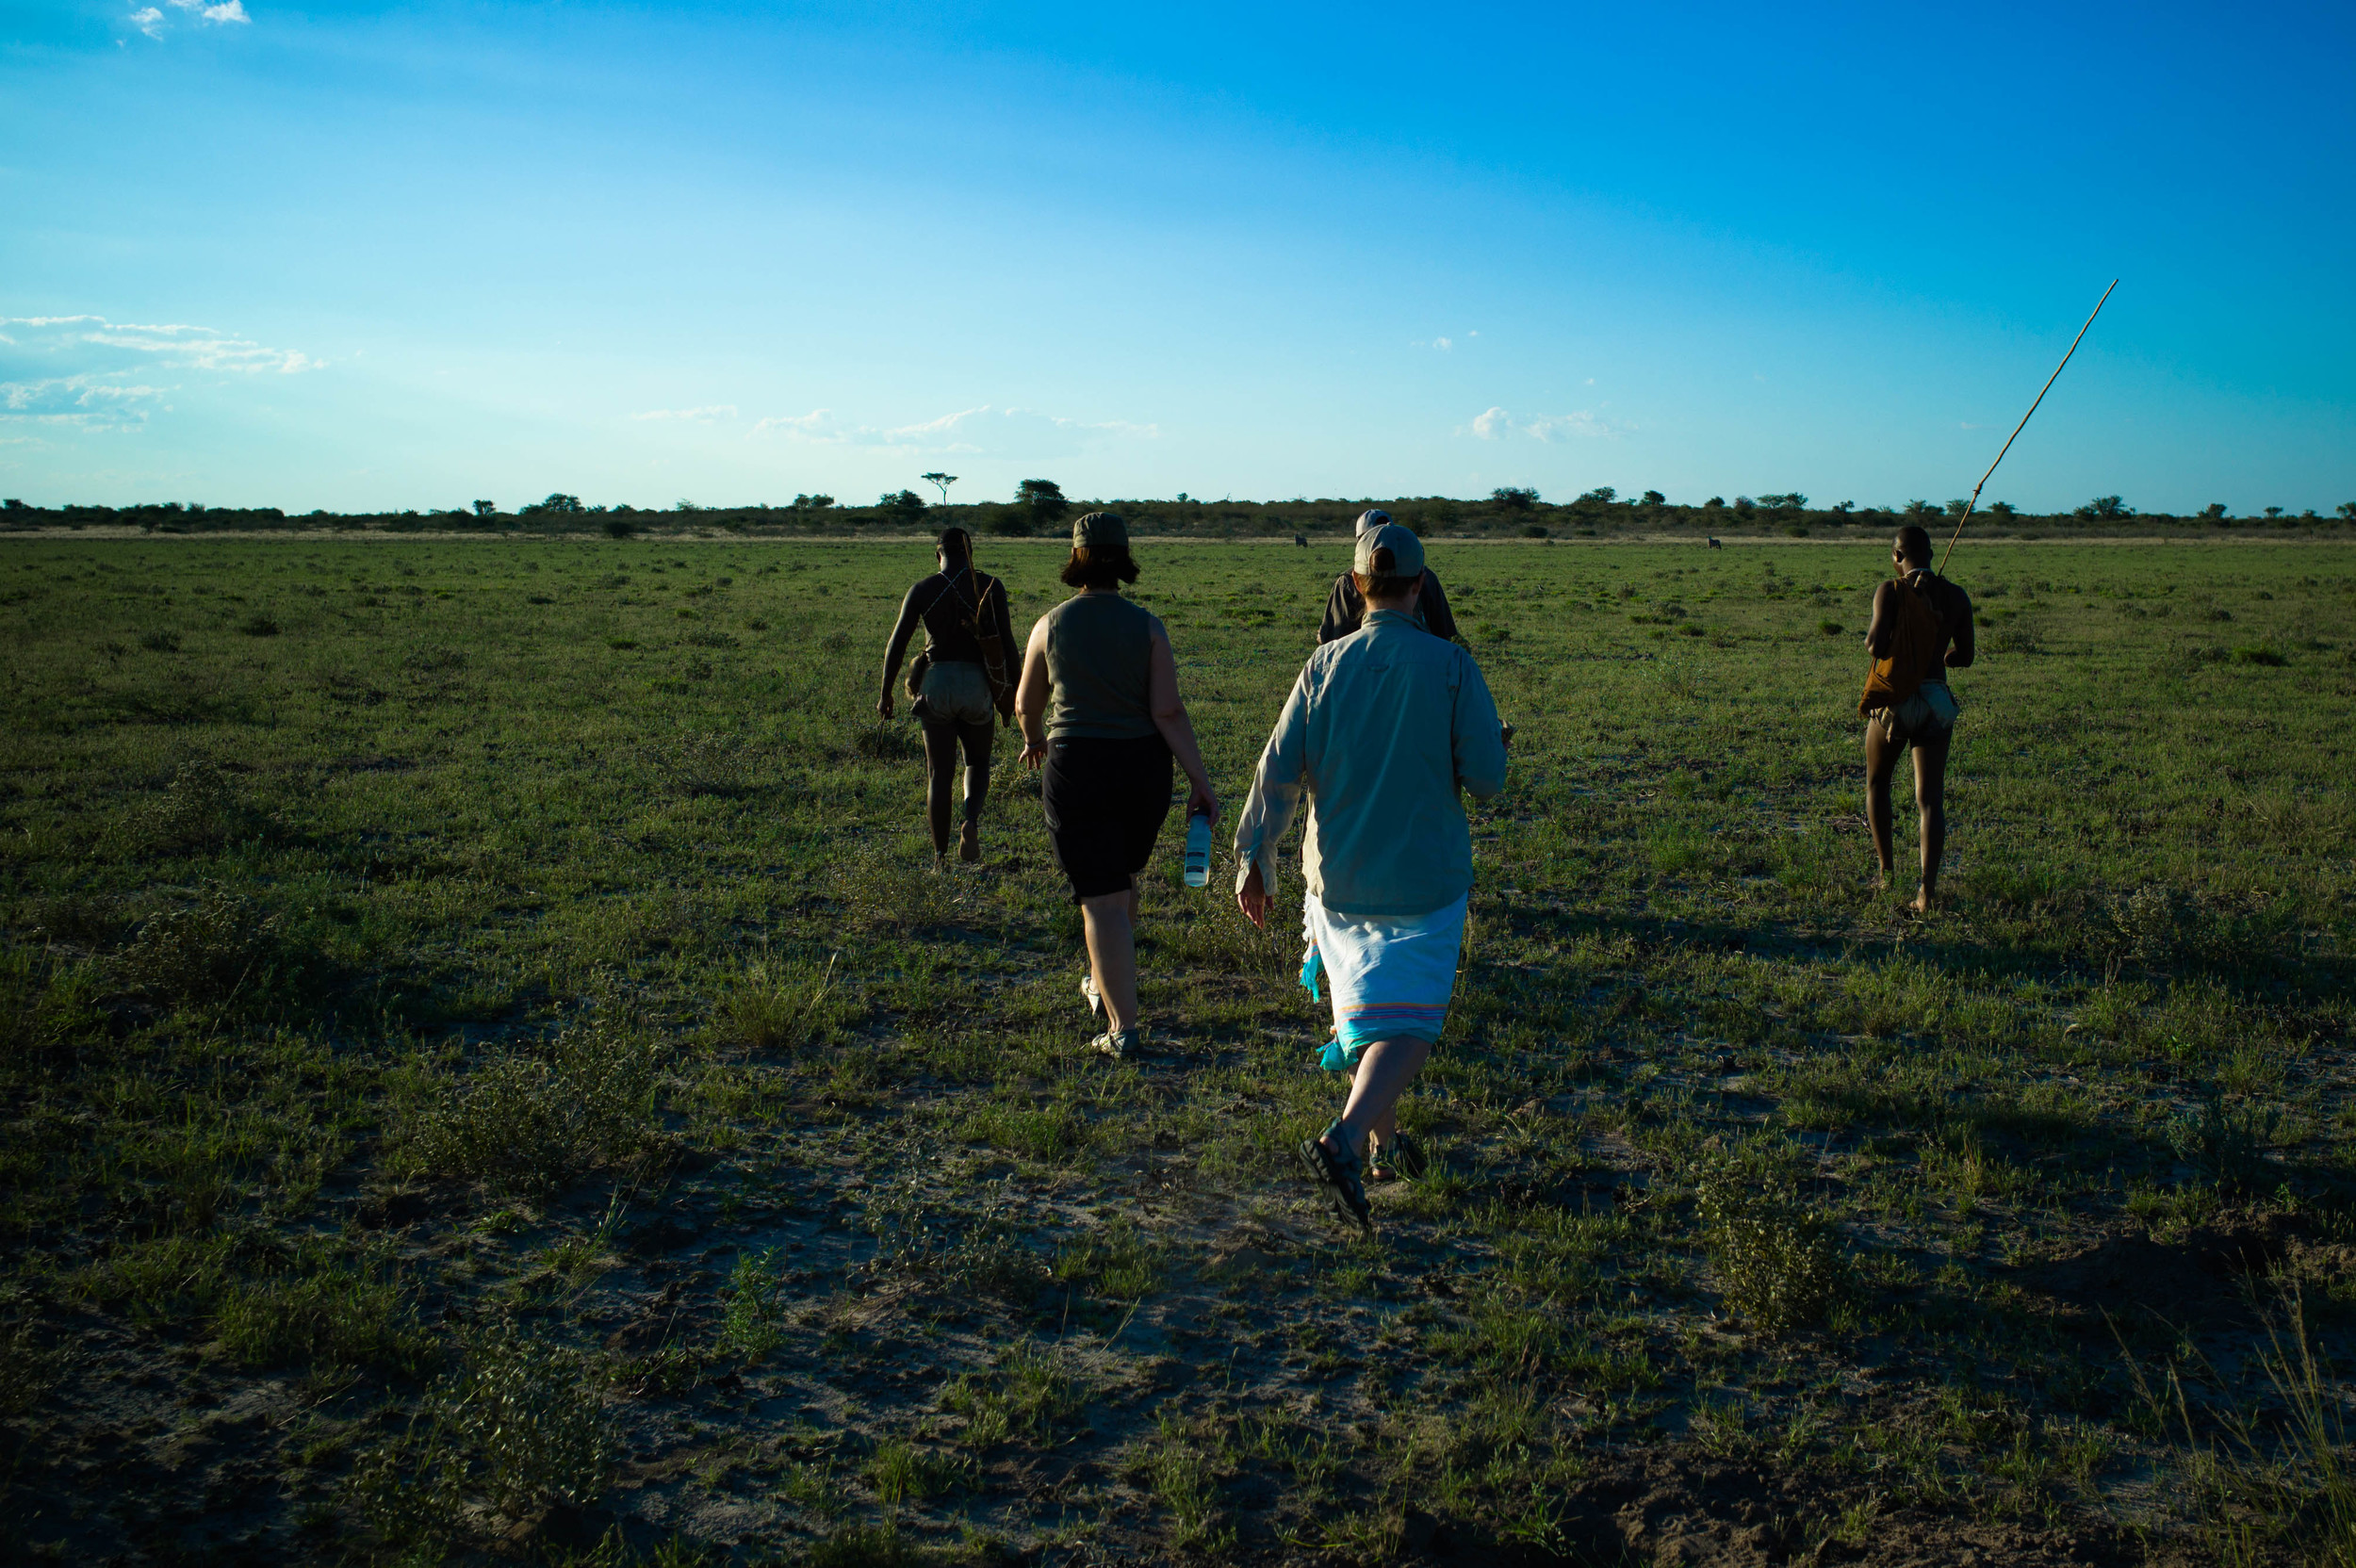 Walking Across the Plain